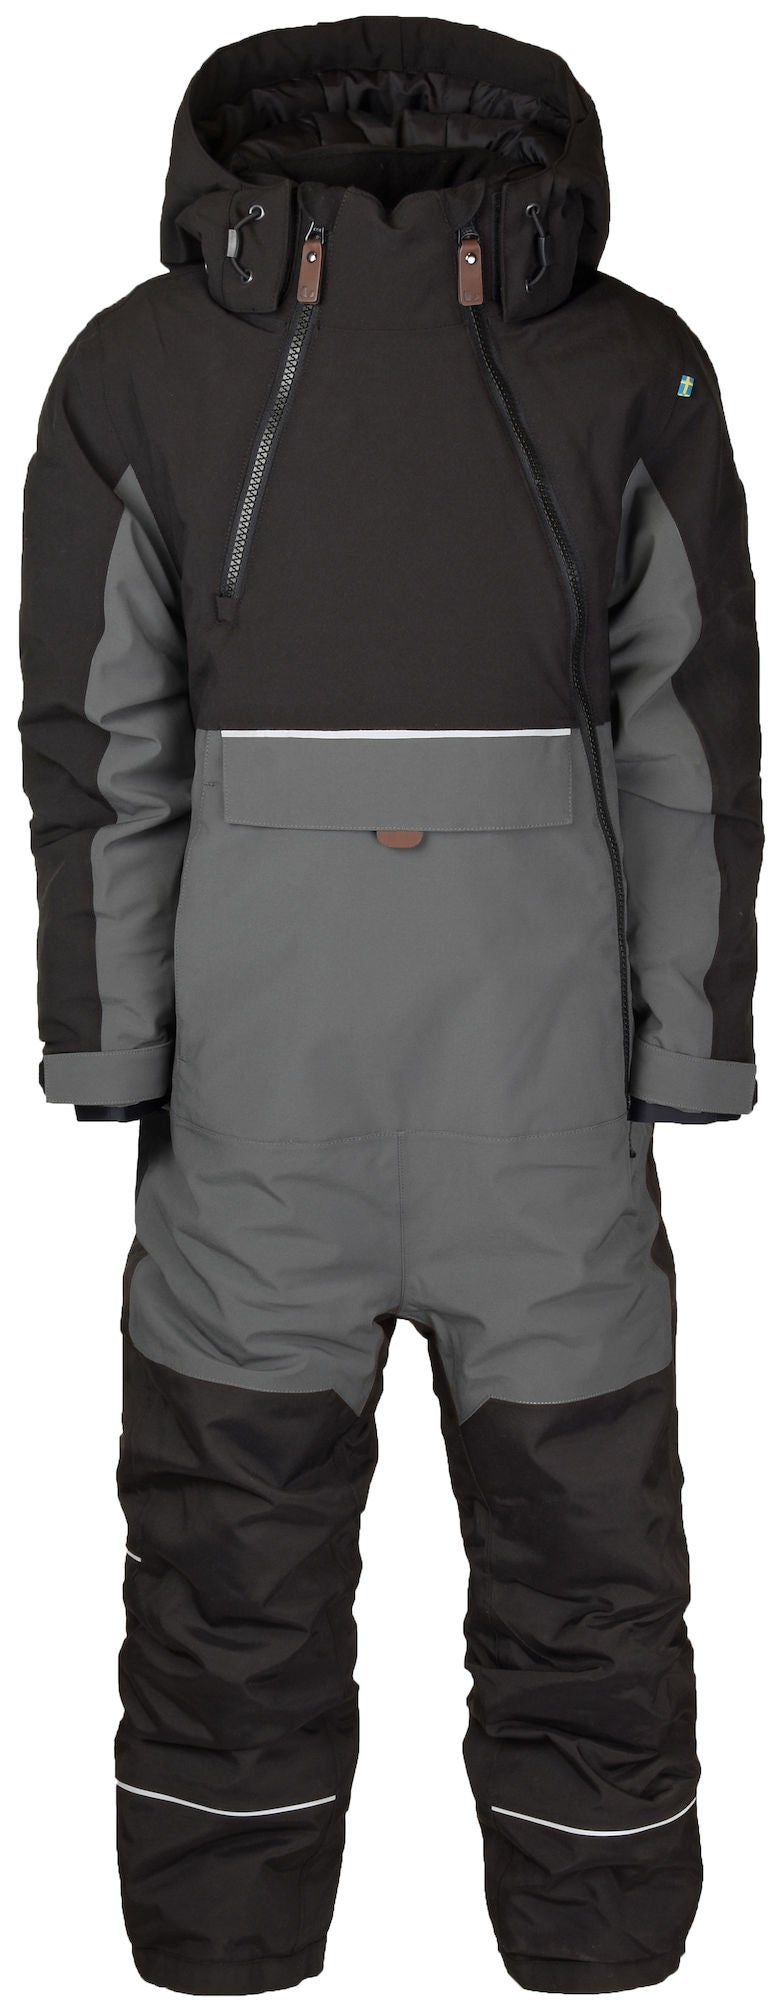 Lindberg Anorak Overall, Grey, 80